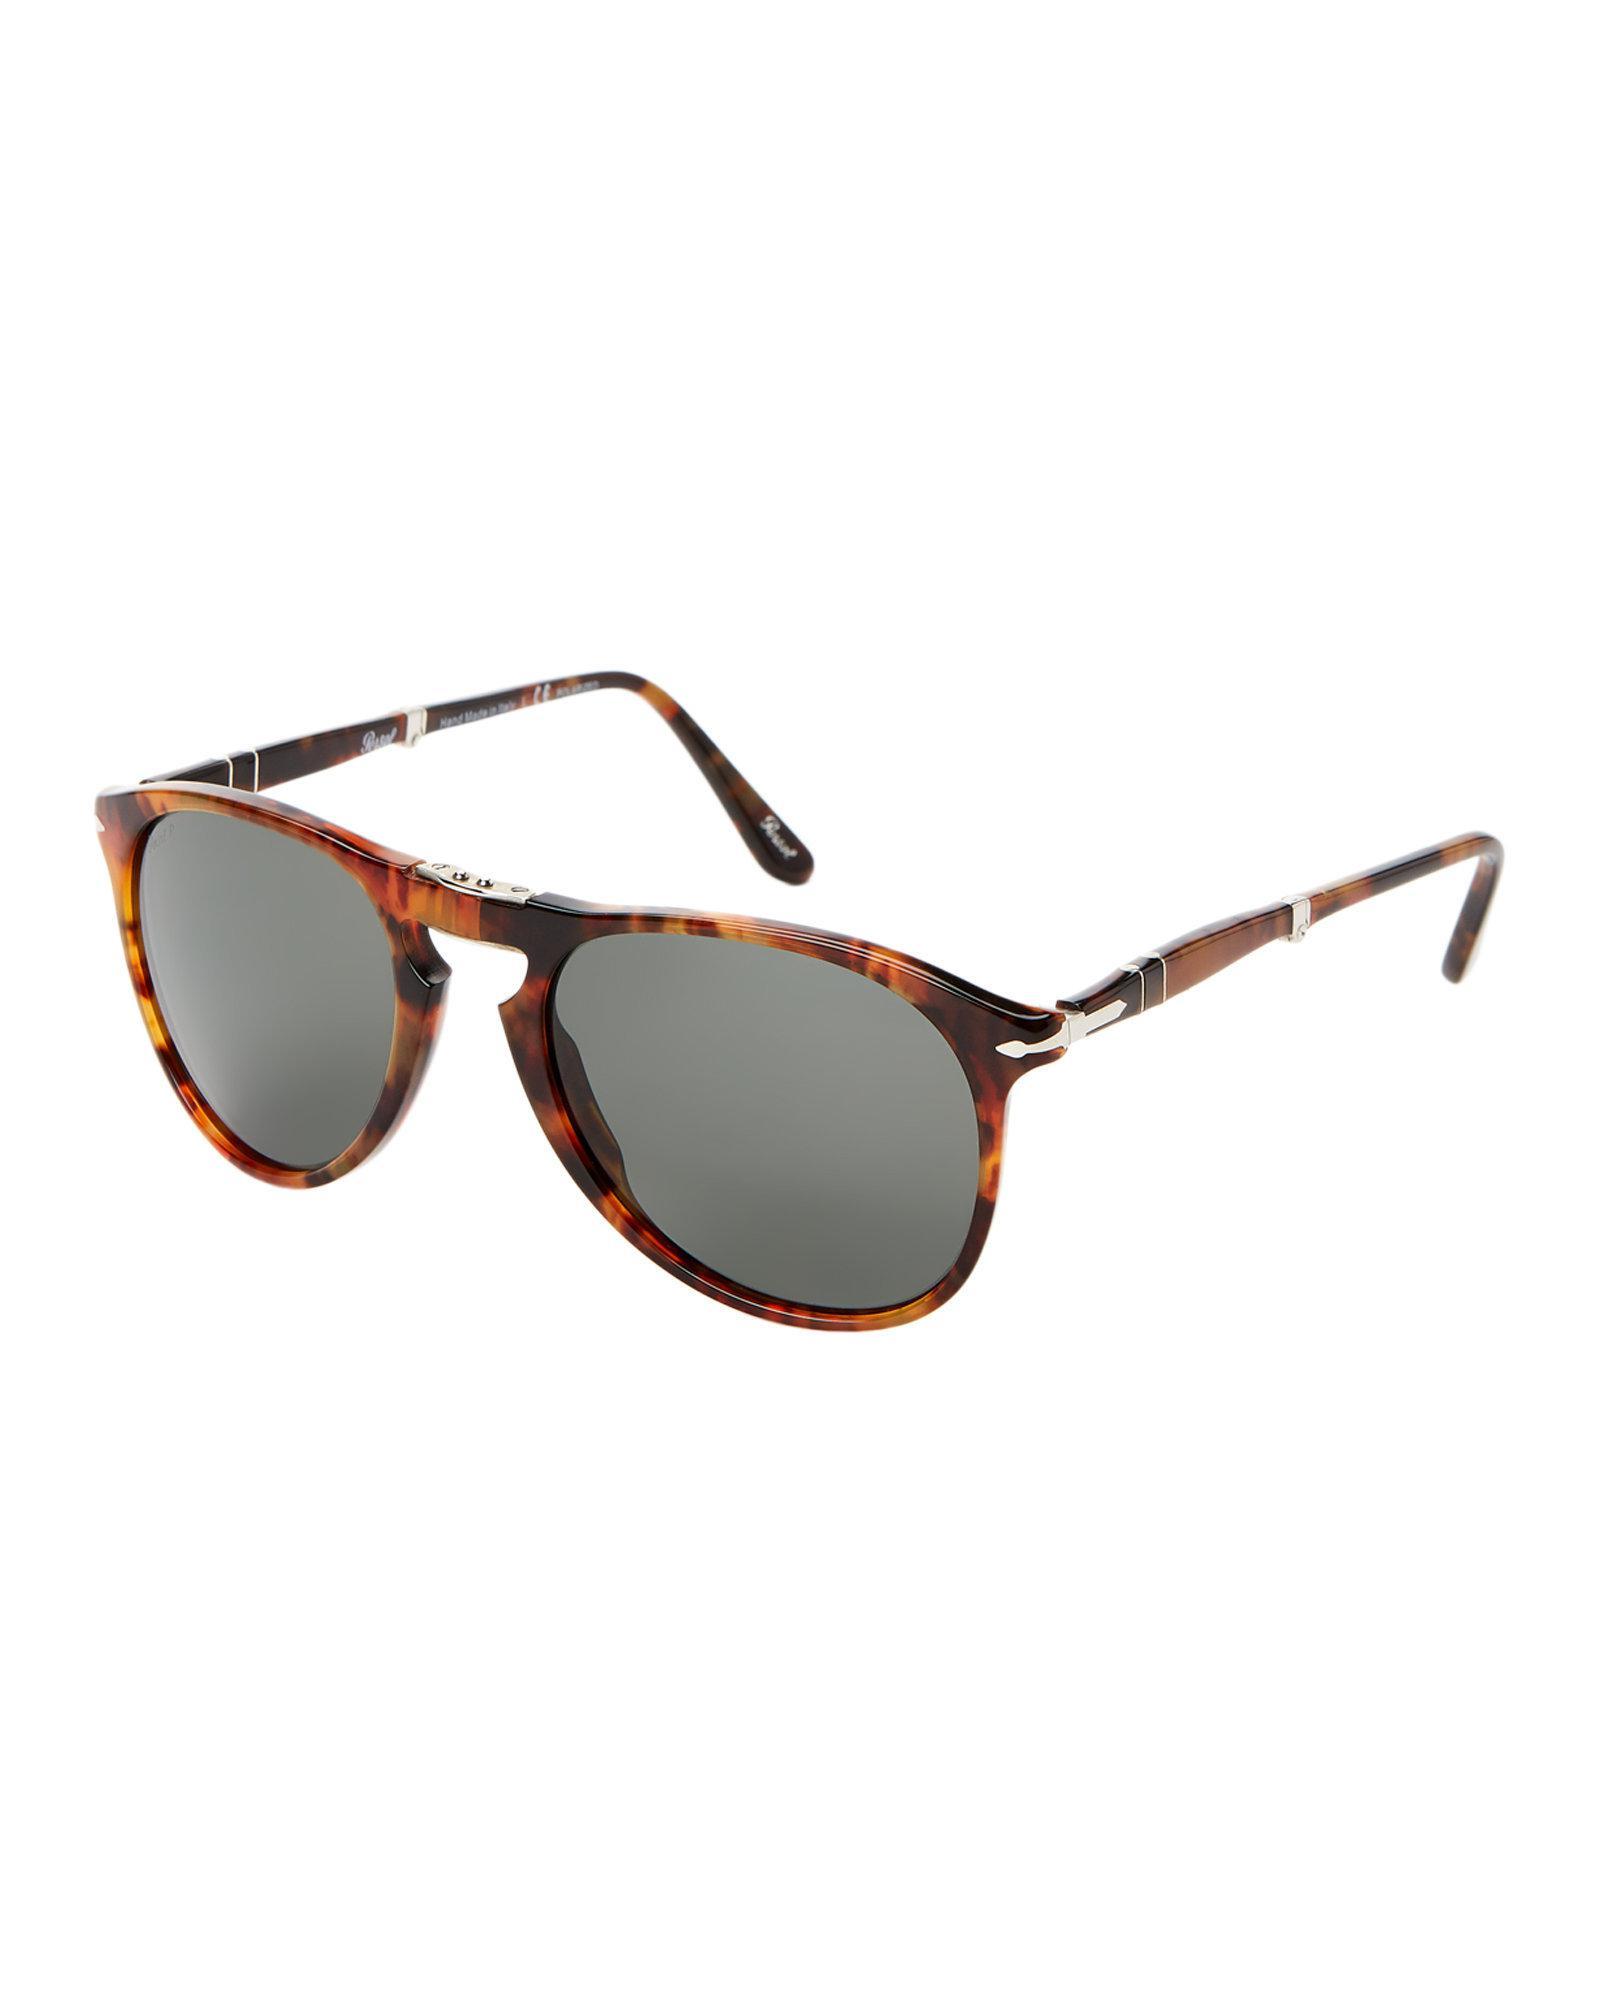 d9249c2bb1 Lyst - Persol Po9714 Caffe Round Polarized Sunglasses